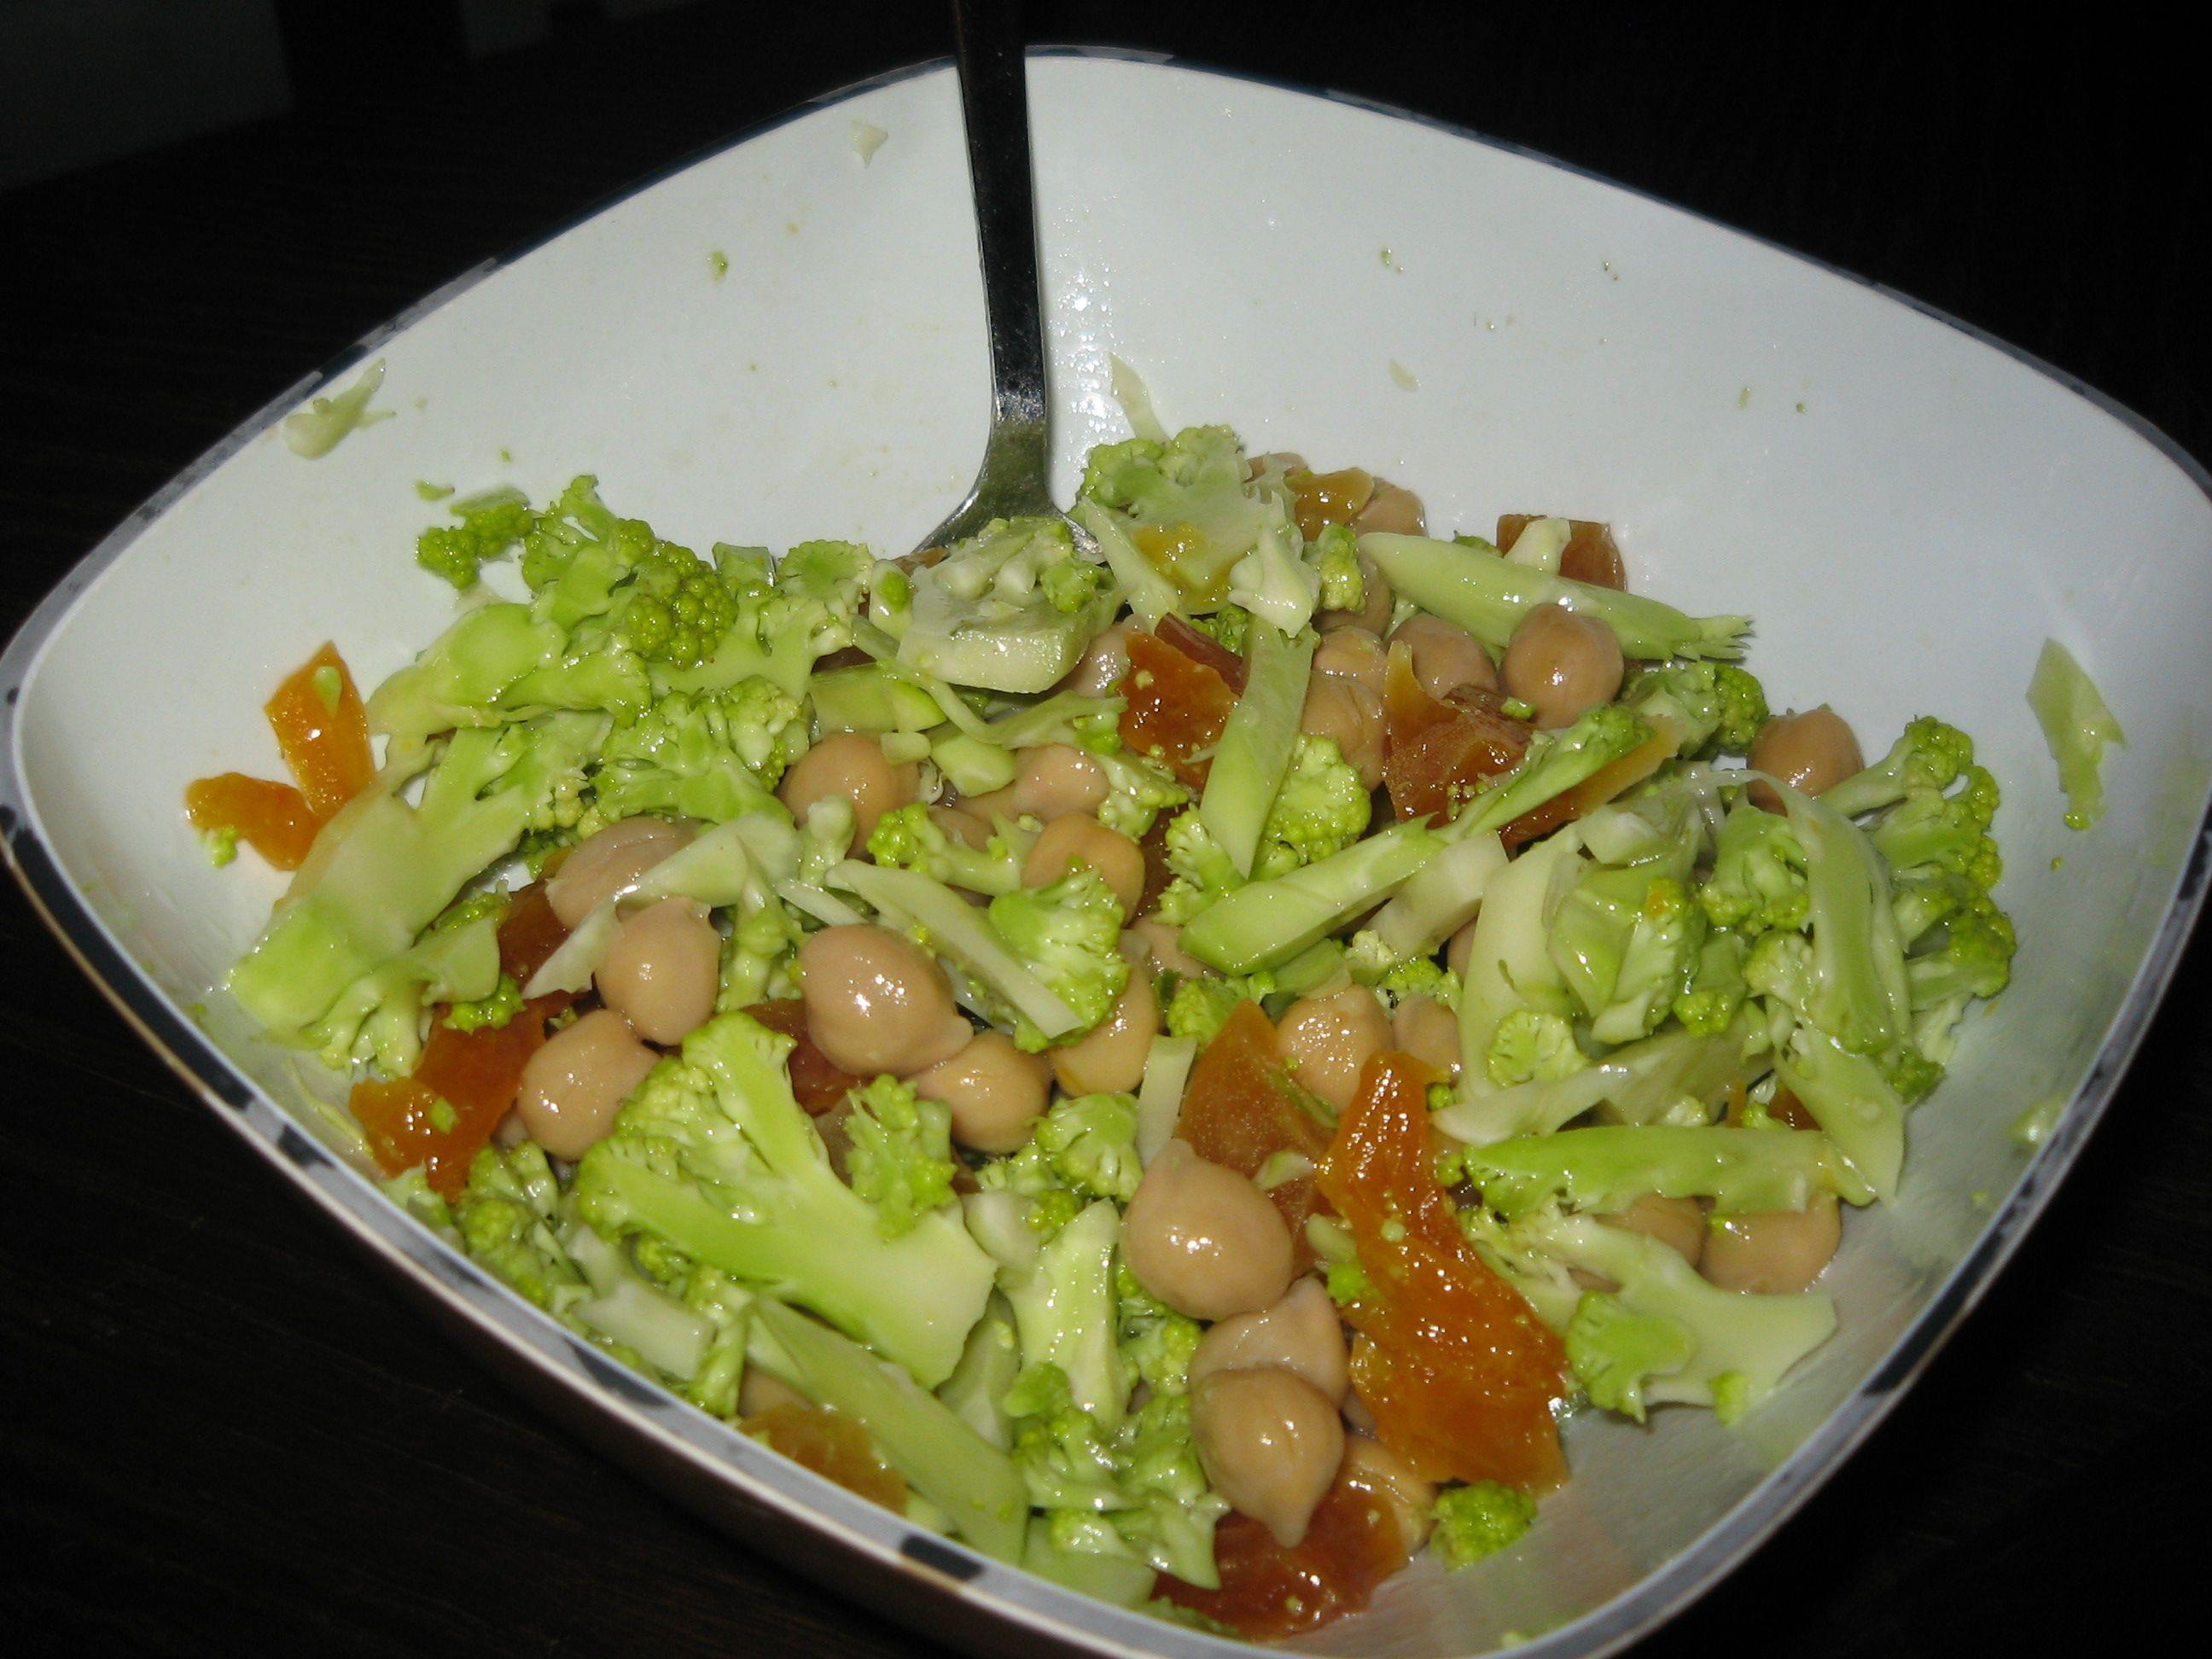 Blomkål-kikærte salat